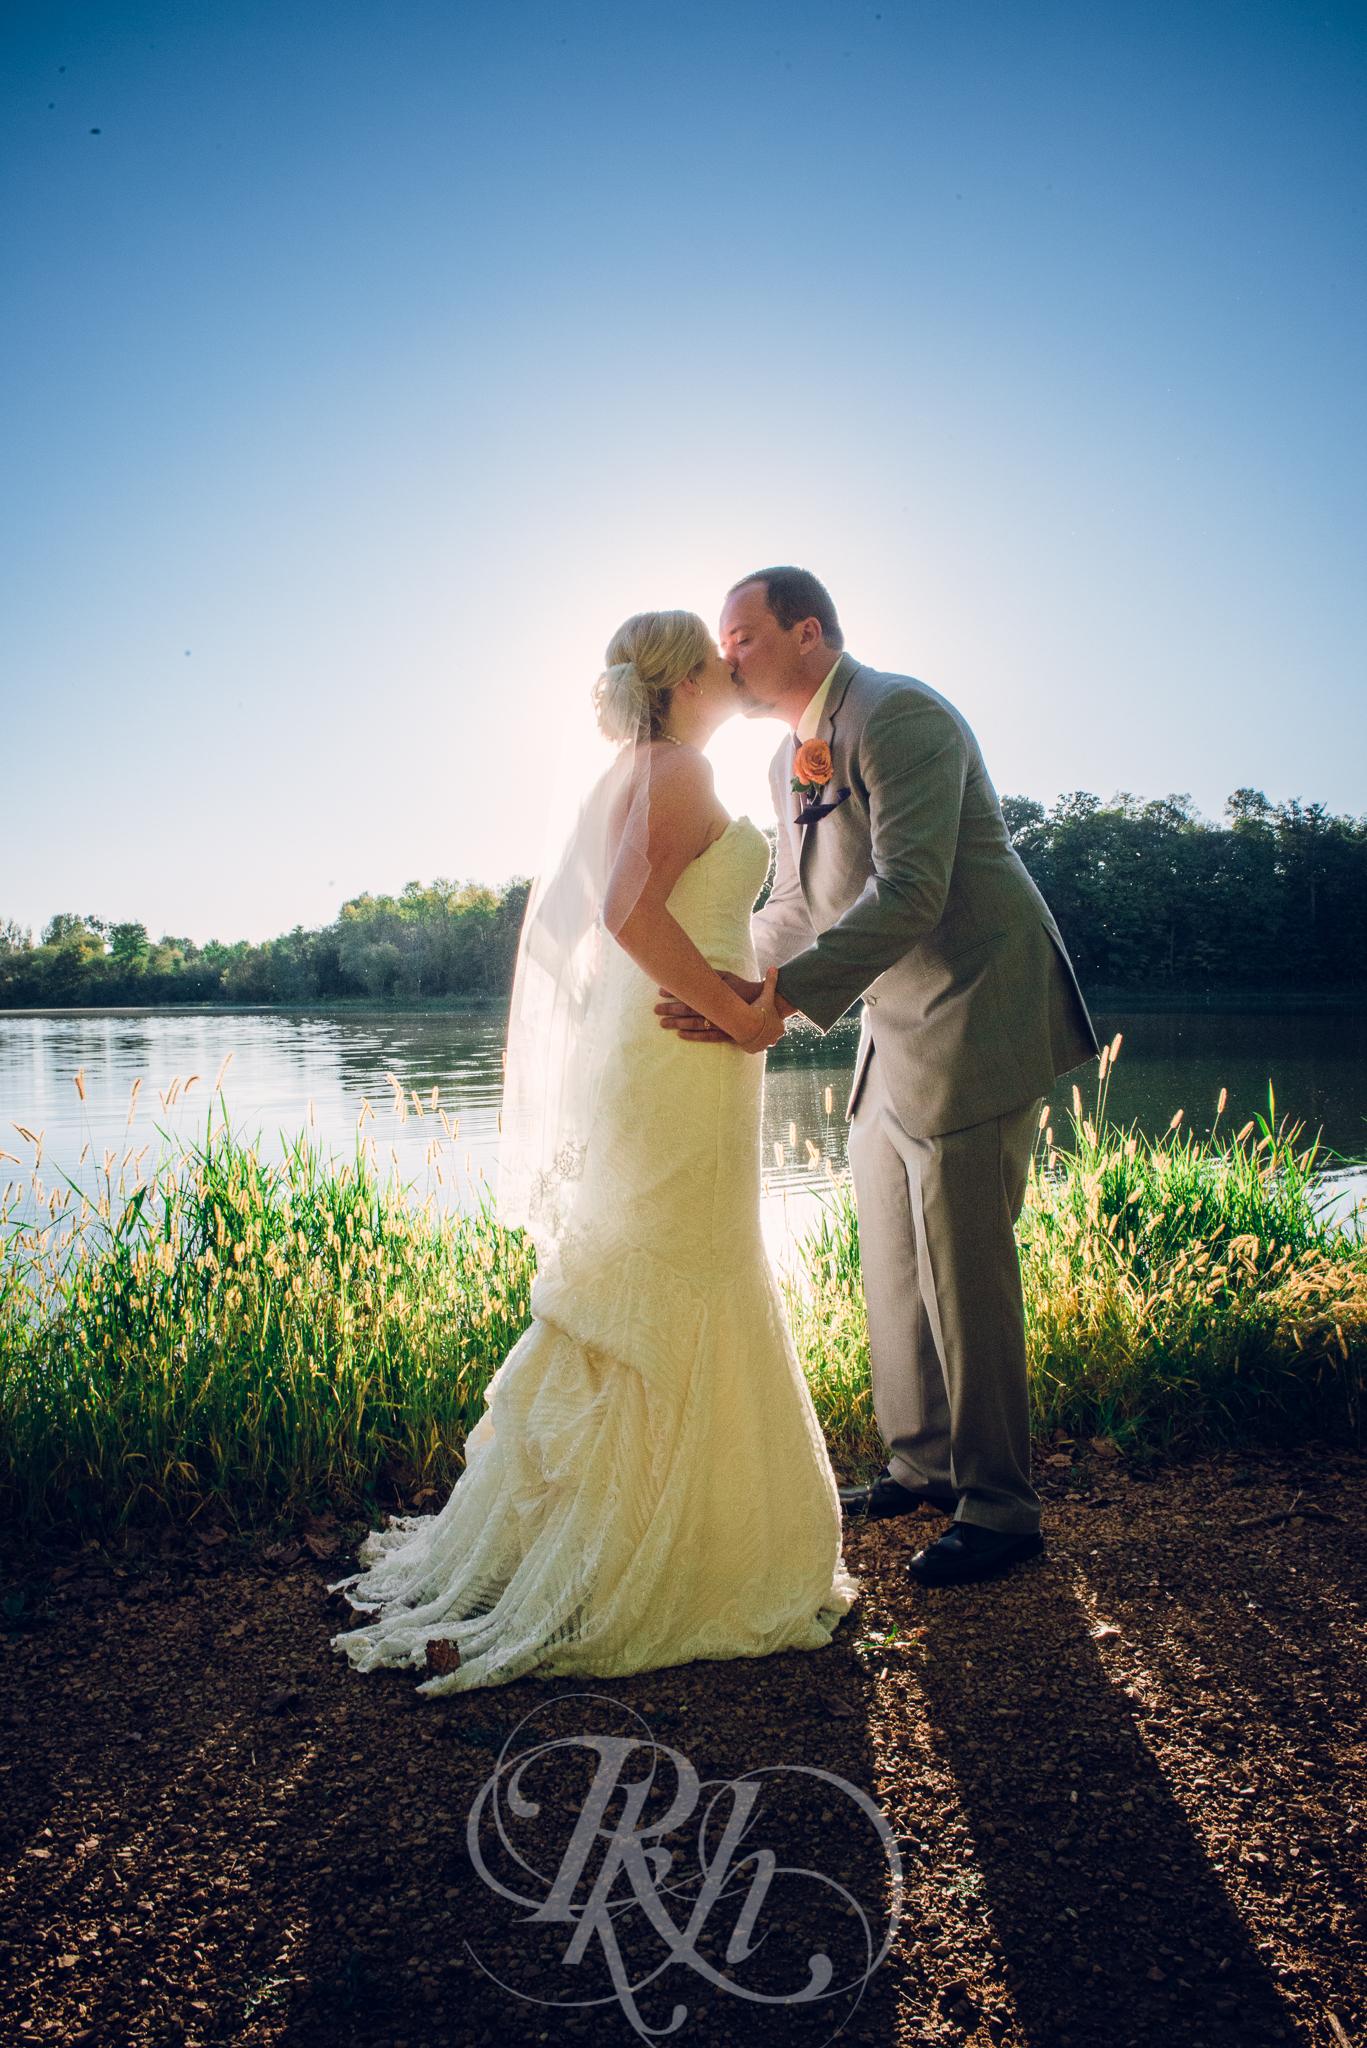 Jackie & Corey - Minnesota Wedding Photography - RKH Images -17.jpg